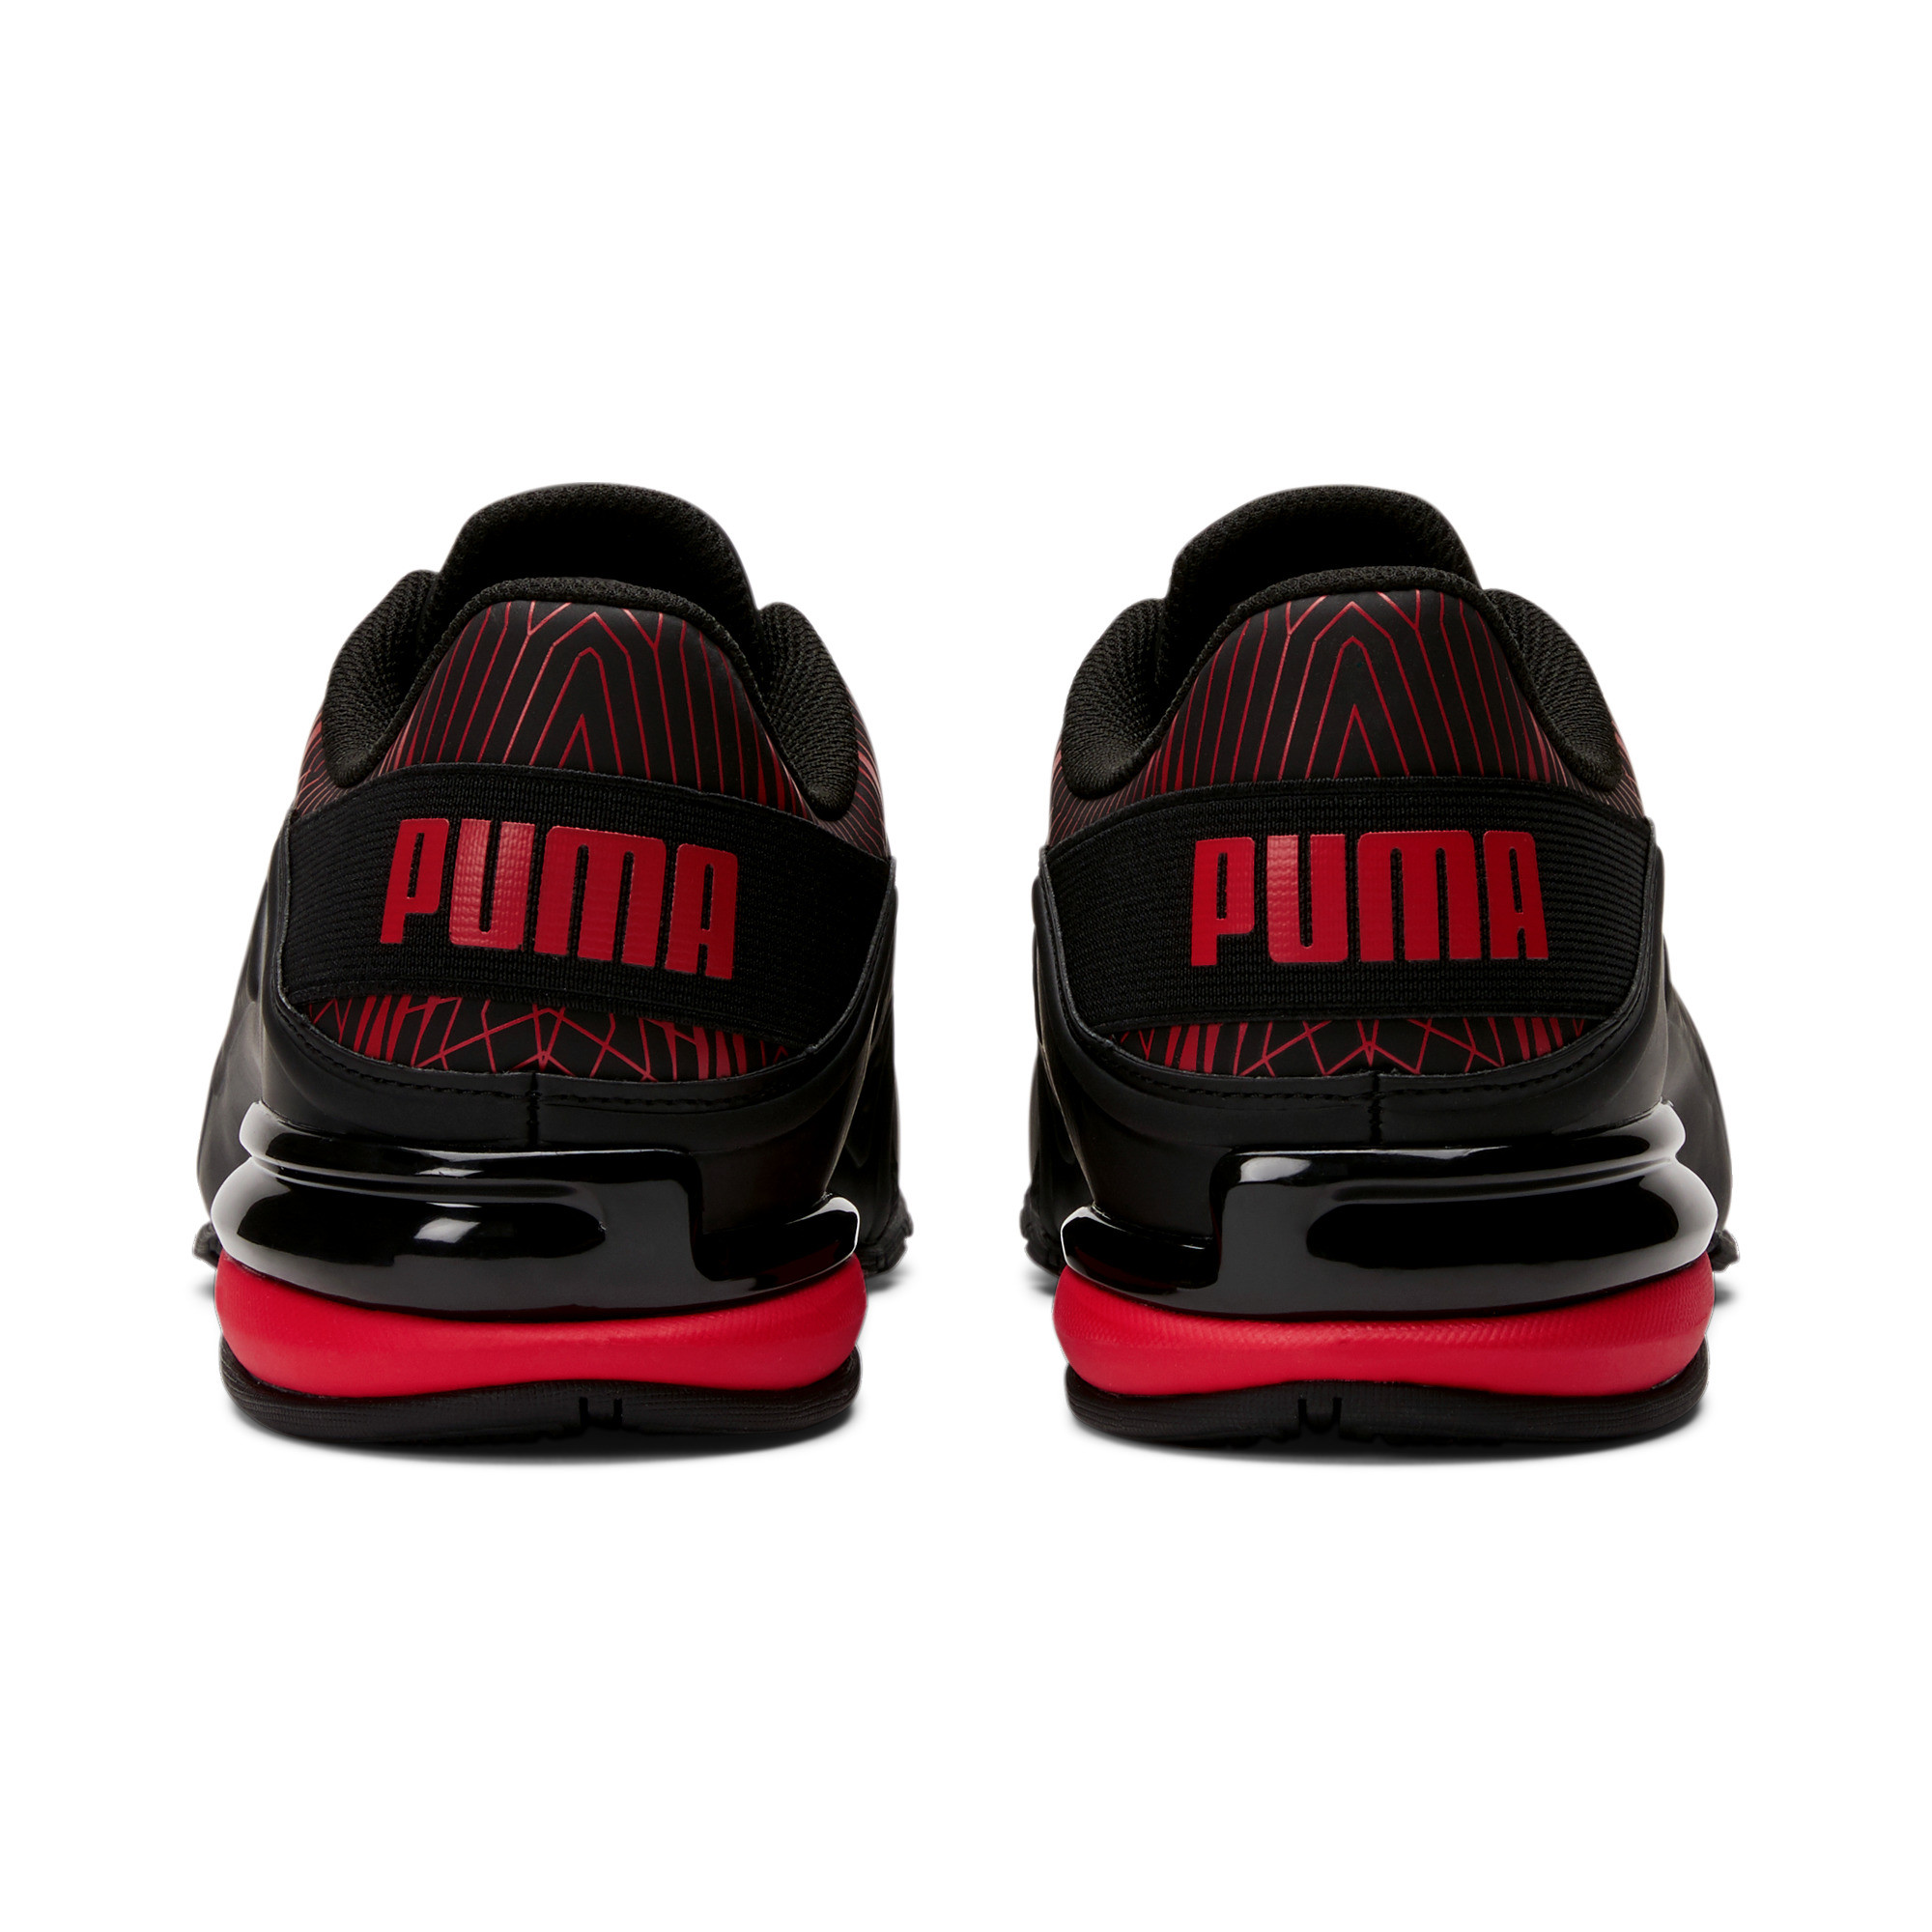 thumbnail 10 - PUMA Men's Viz Runner Graphic Sneakers